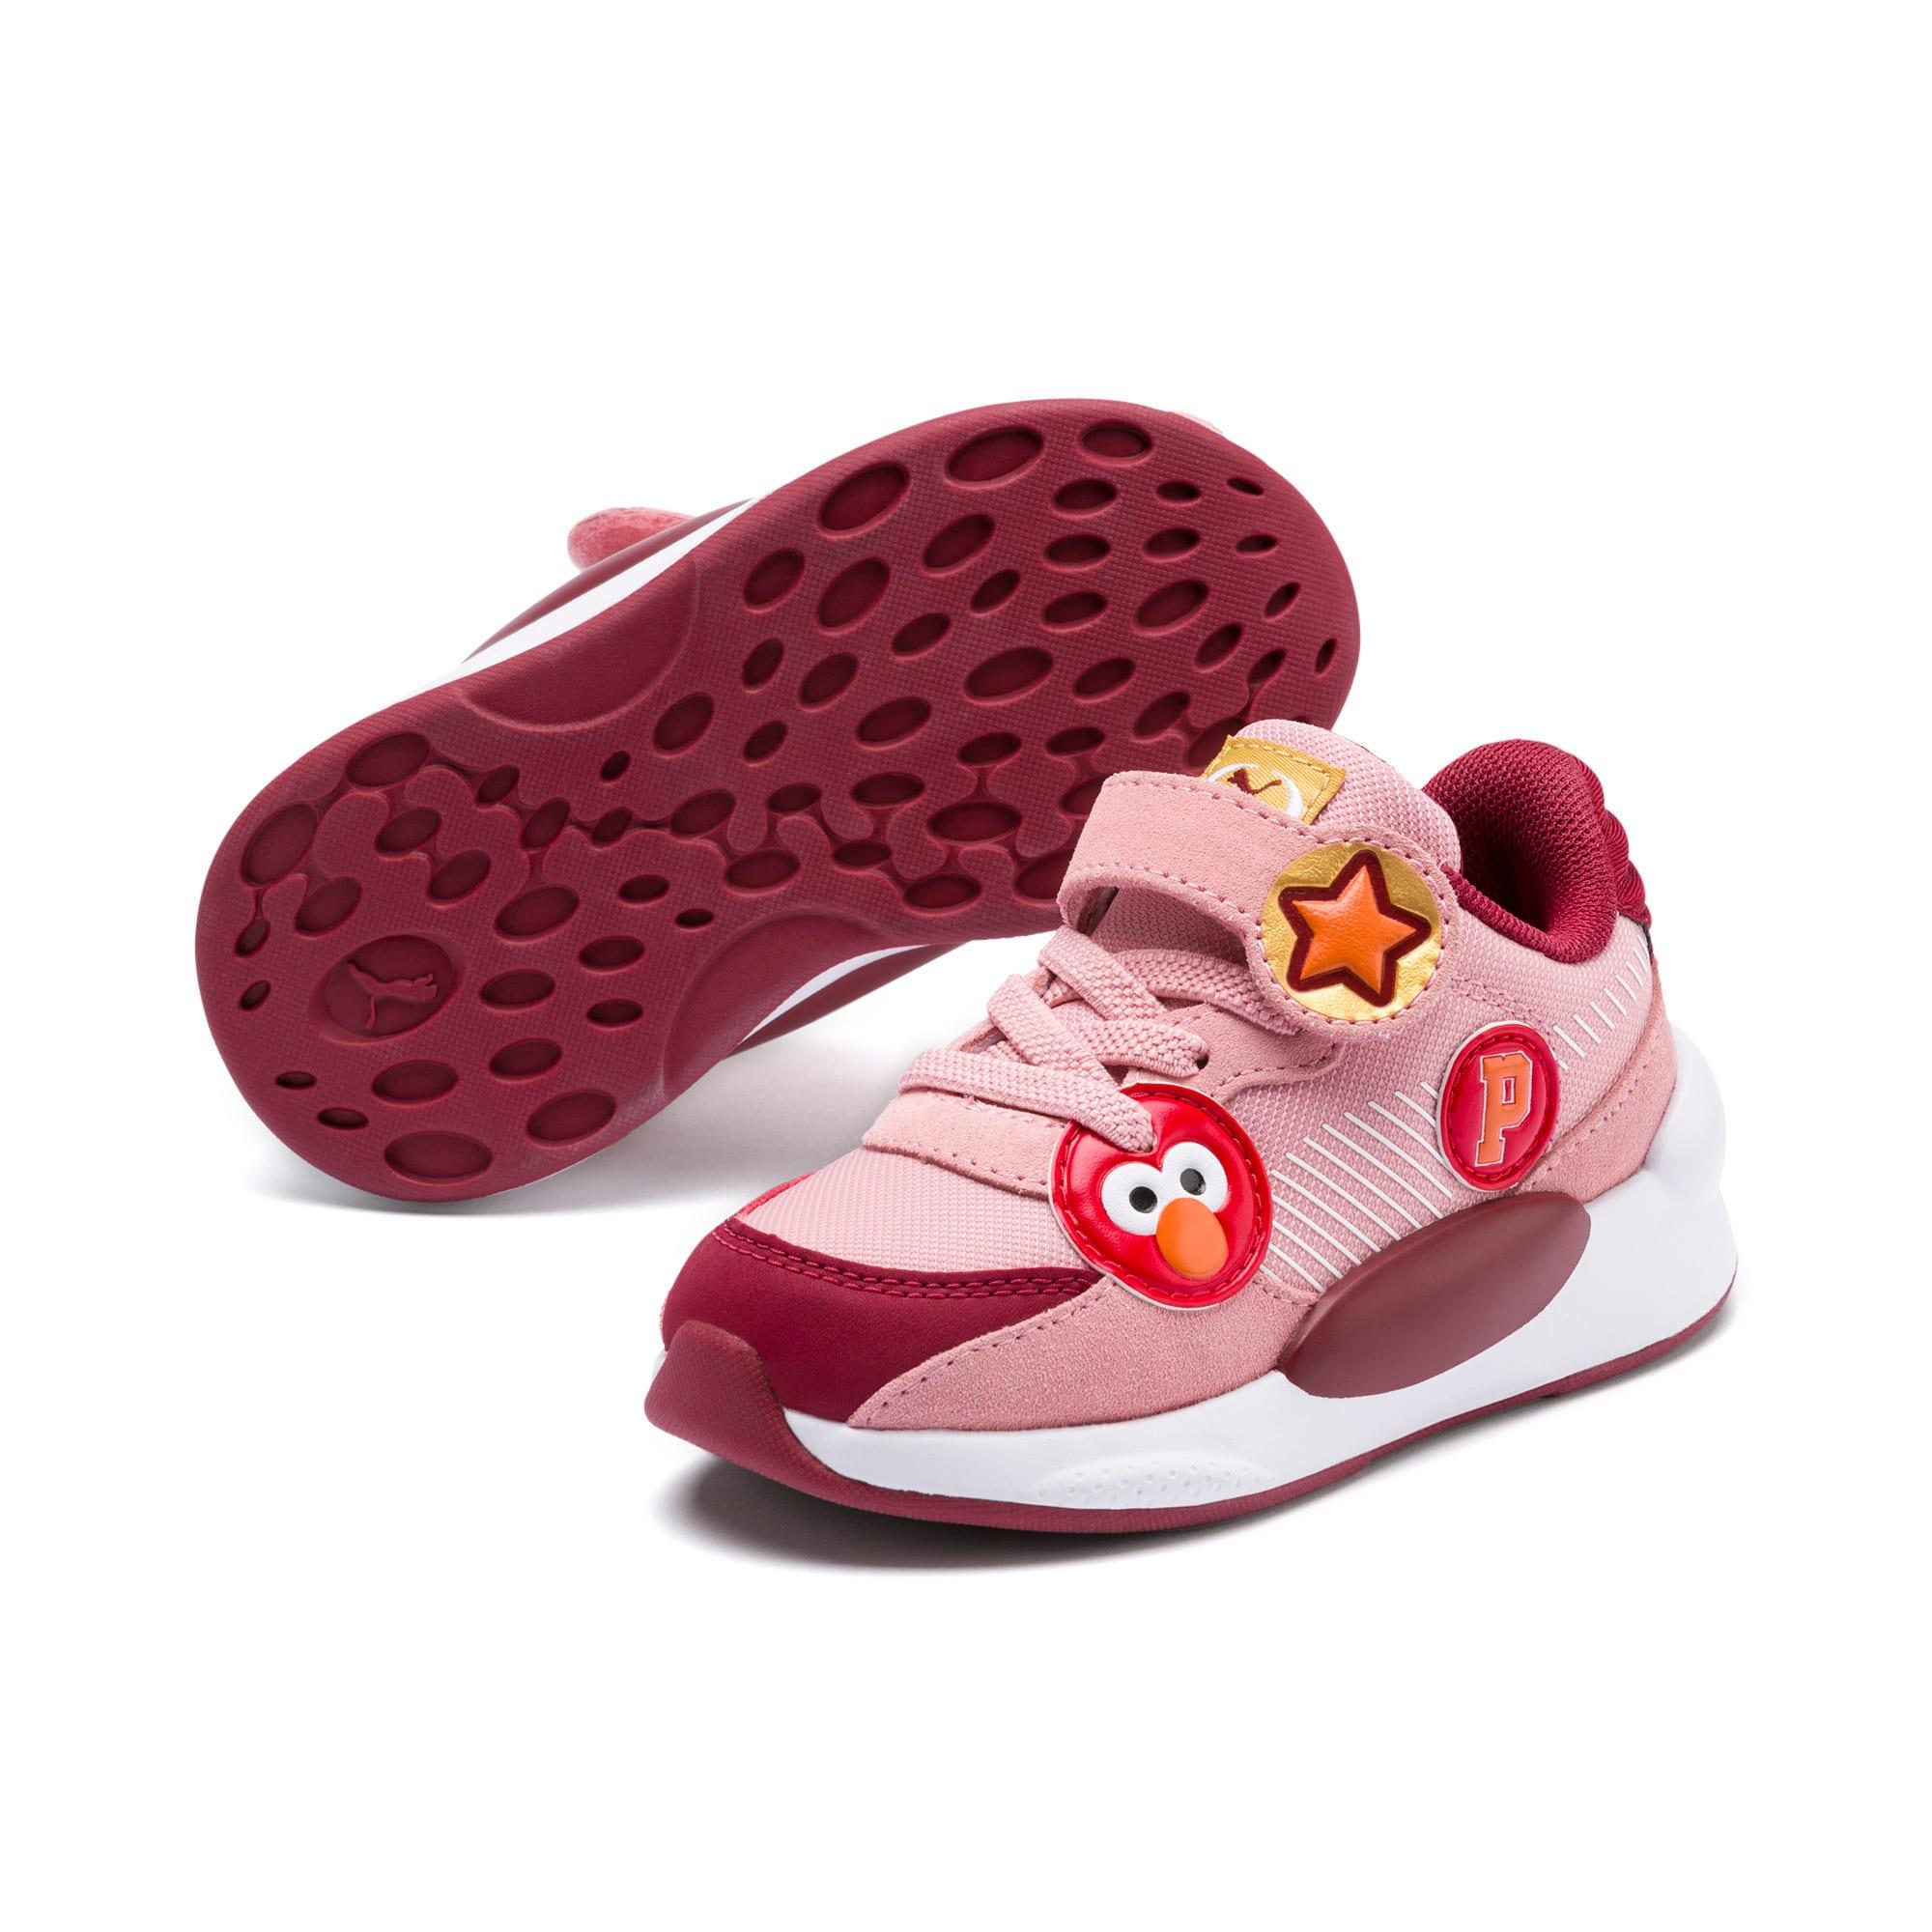 Thumbnail 2 of PUMA x SESAME STREET 50 RS 9.8 Toddler Shoes, Bridal Rose-Rhubarb, medium